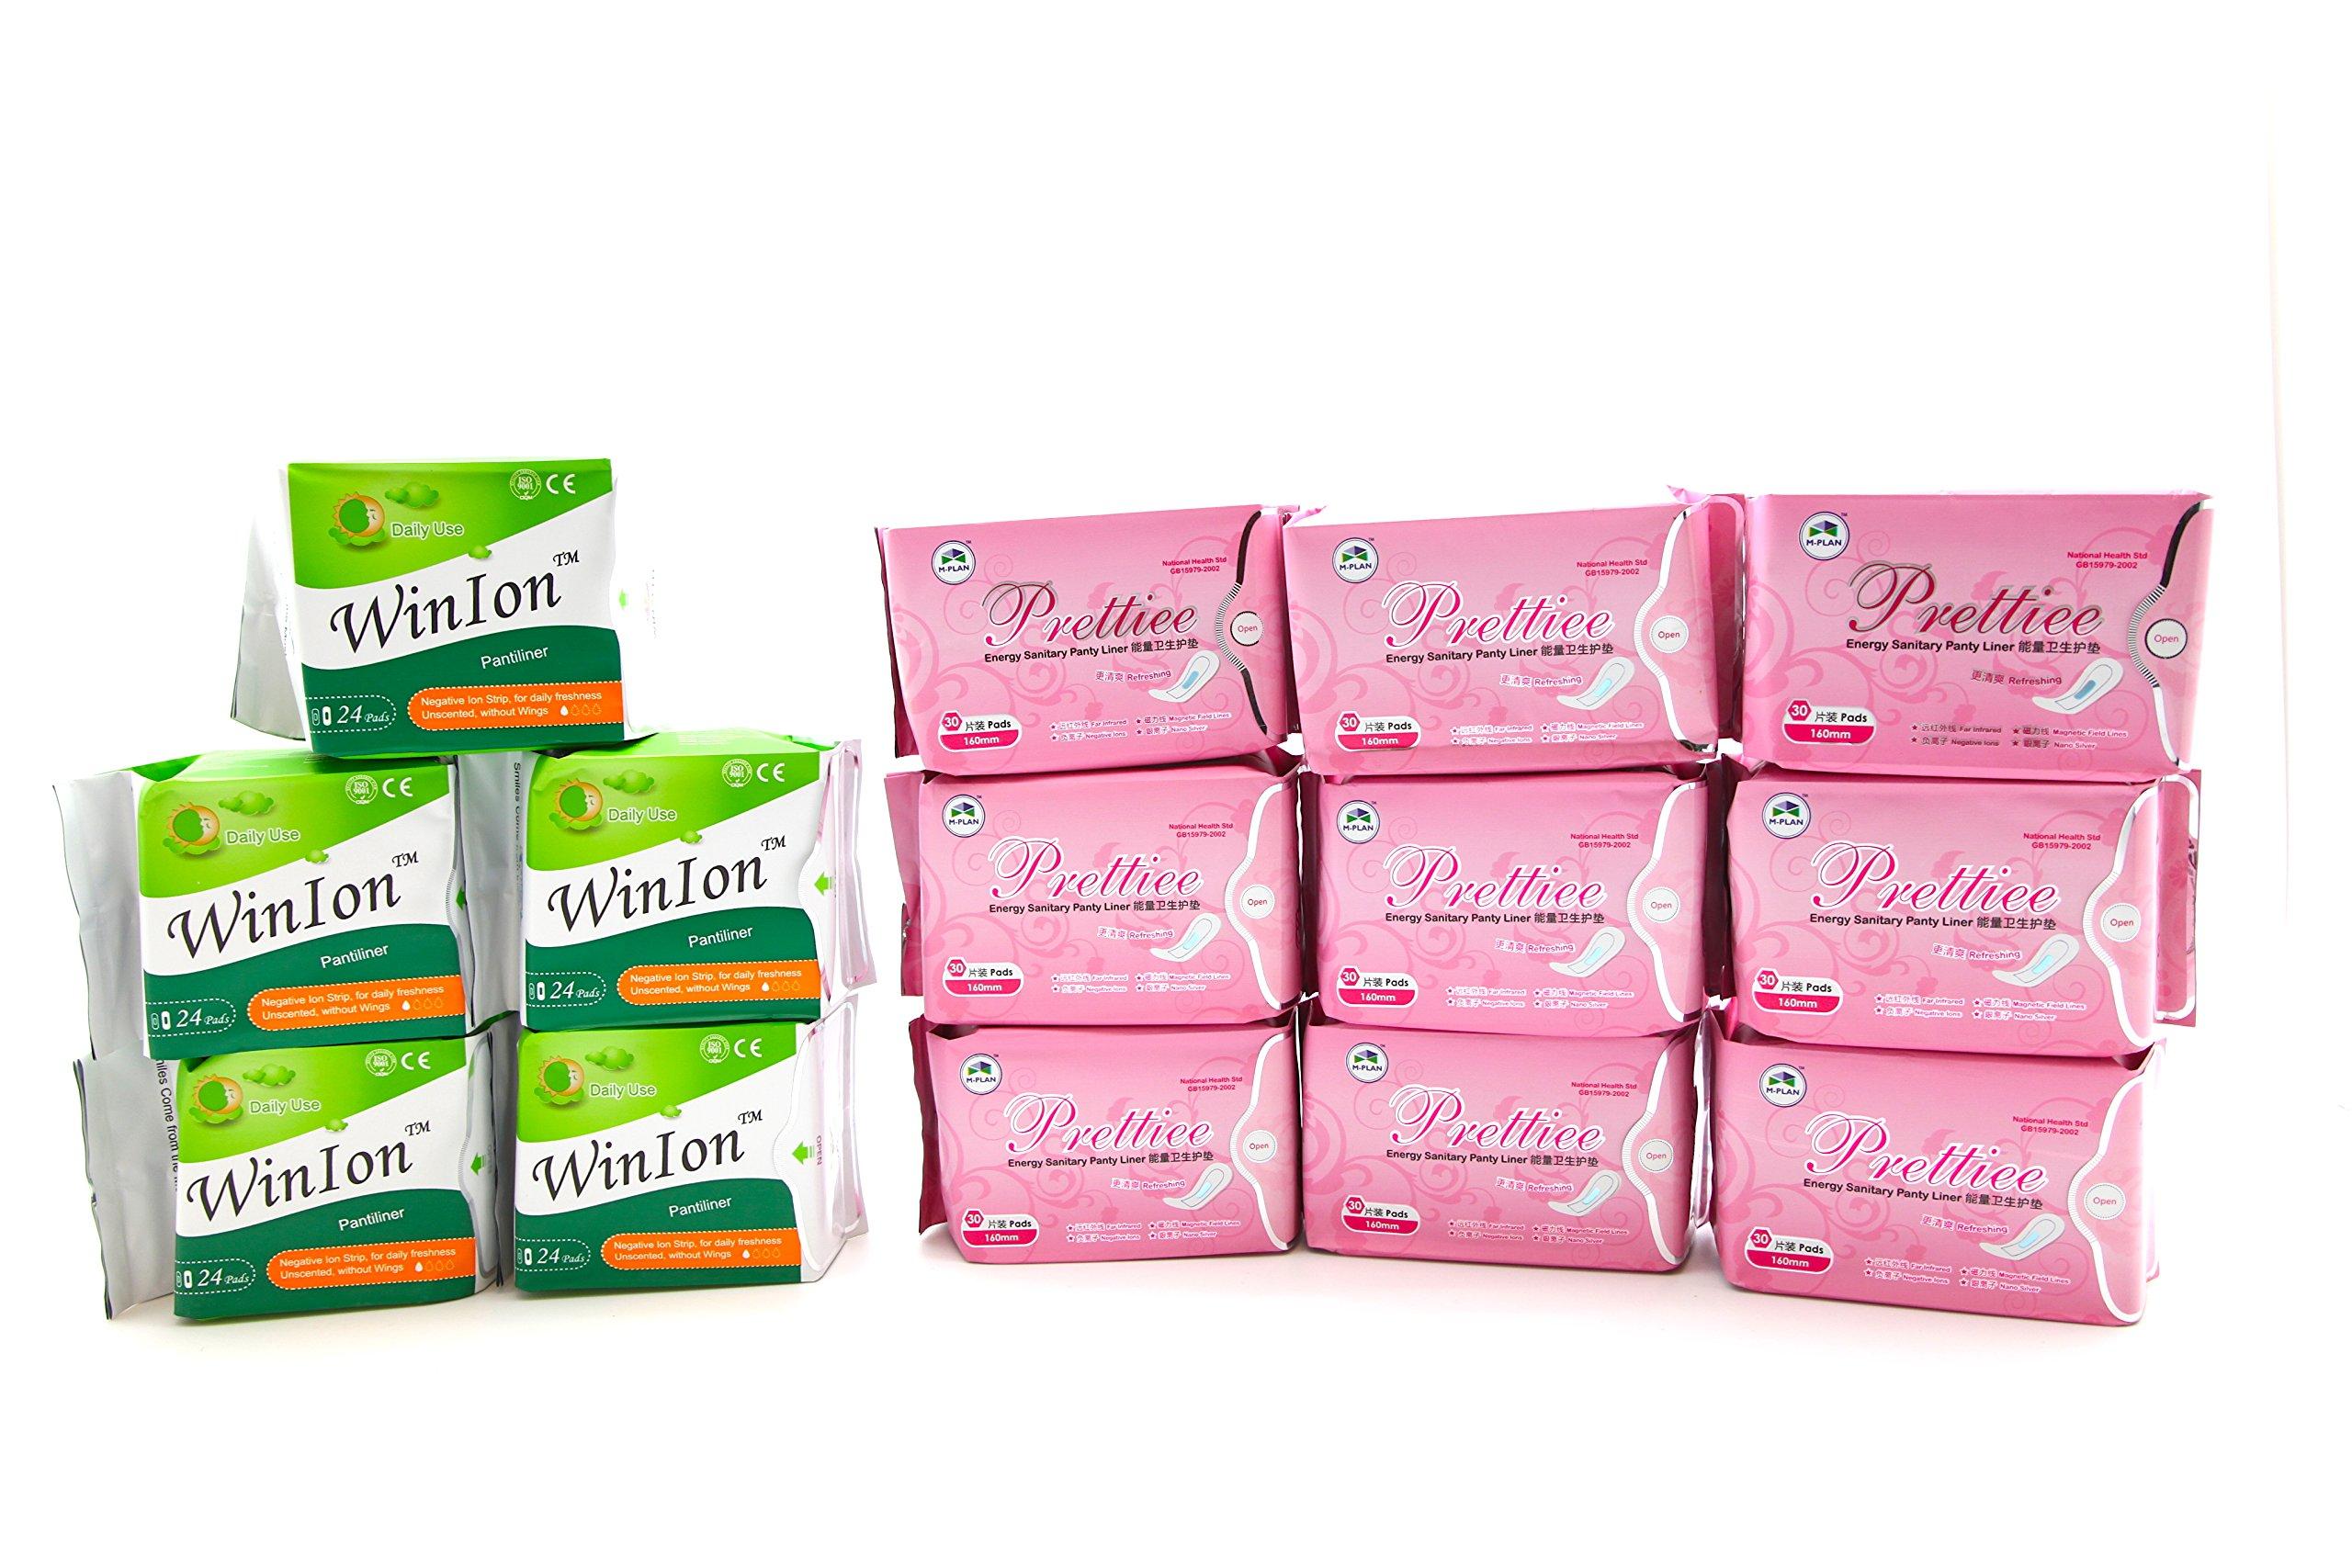 5 packs Winion Pantiliner + 9 packs Prettiee Energy Sanitary Panty liner by Prettiee (Image #1)